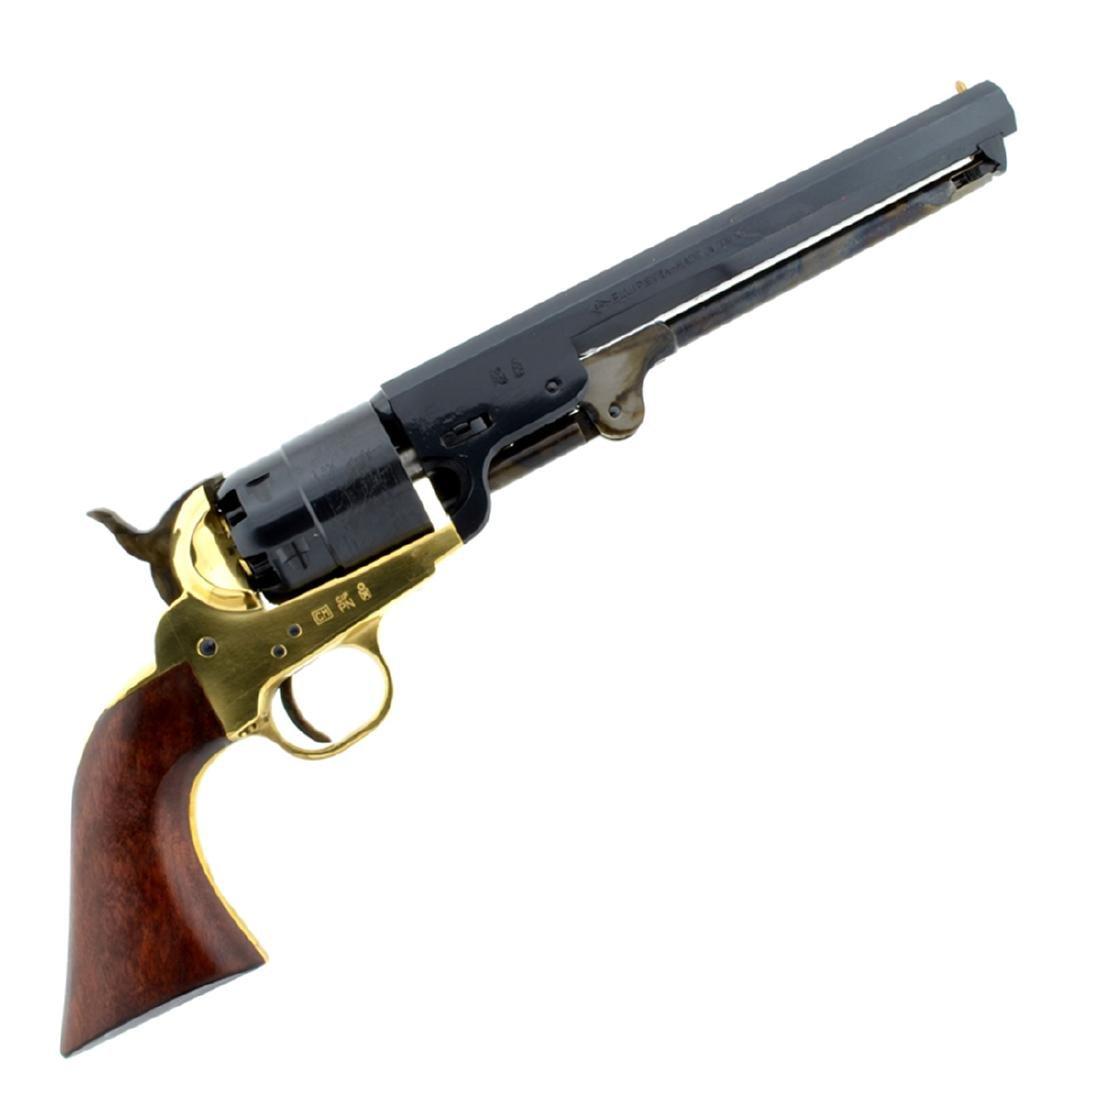 Gun Exquisite New, Original Box, Papers, Traditions - 2